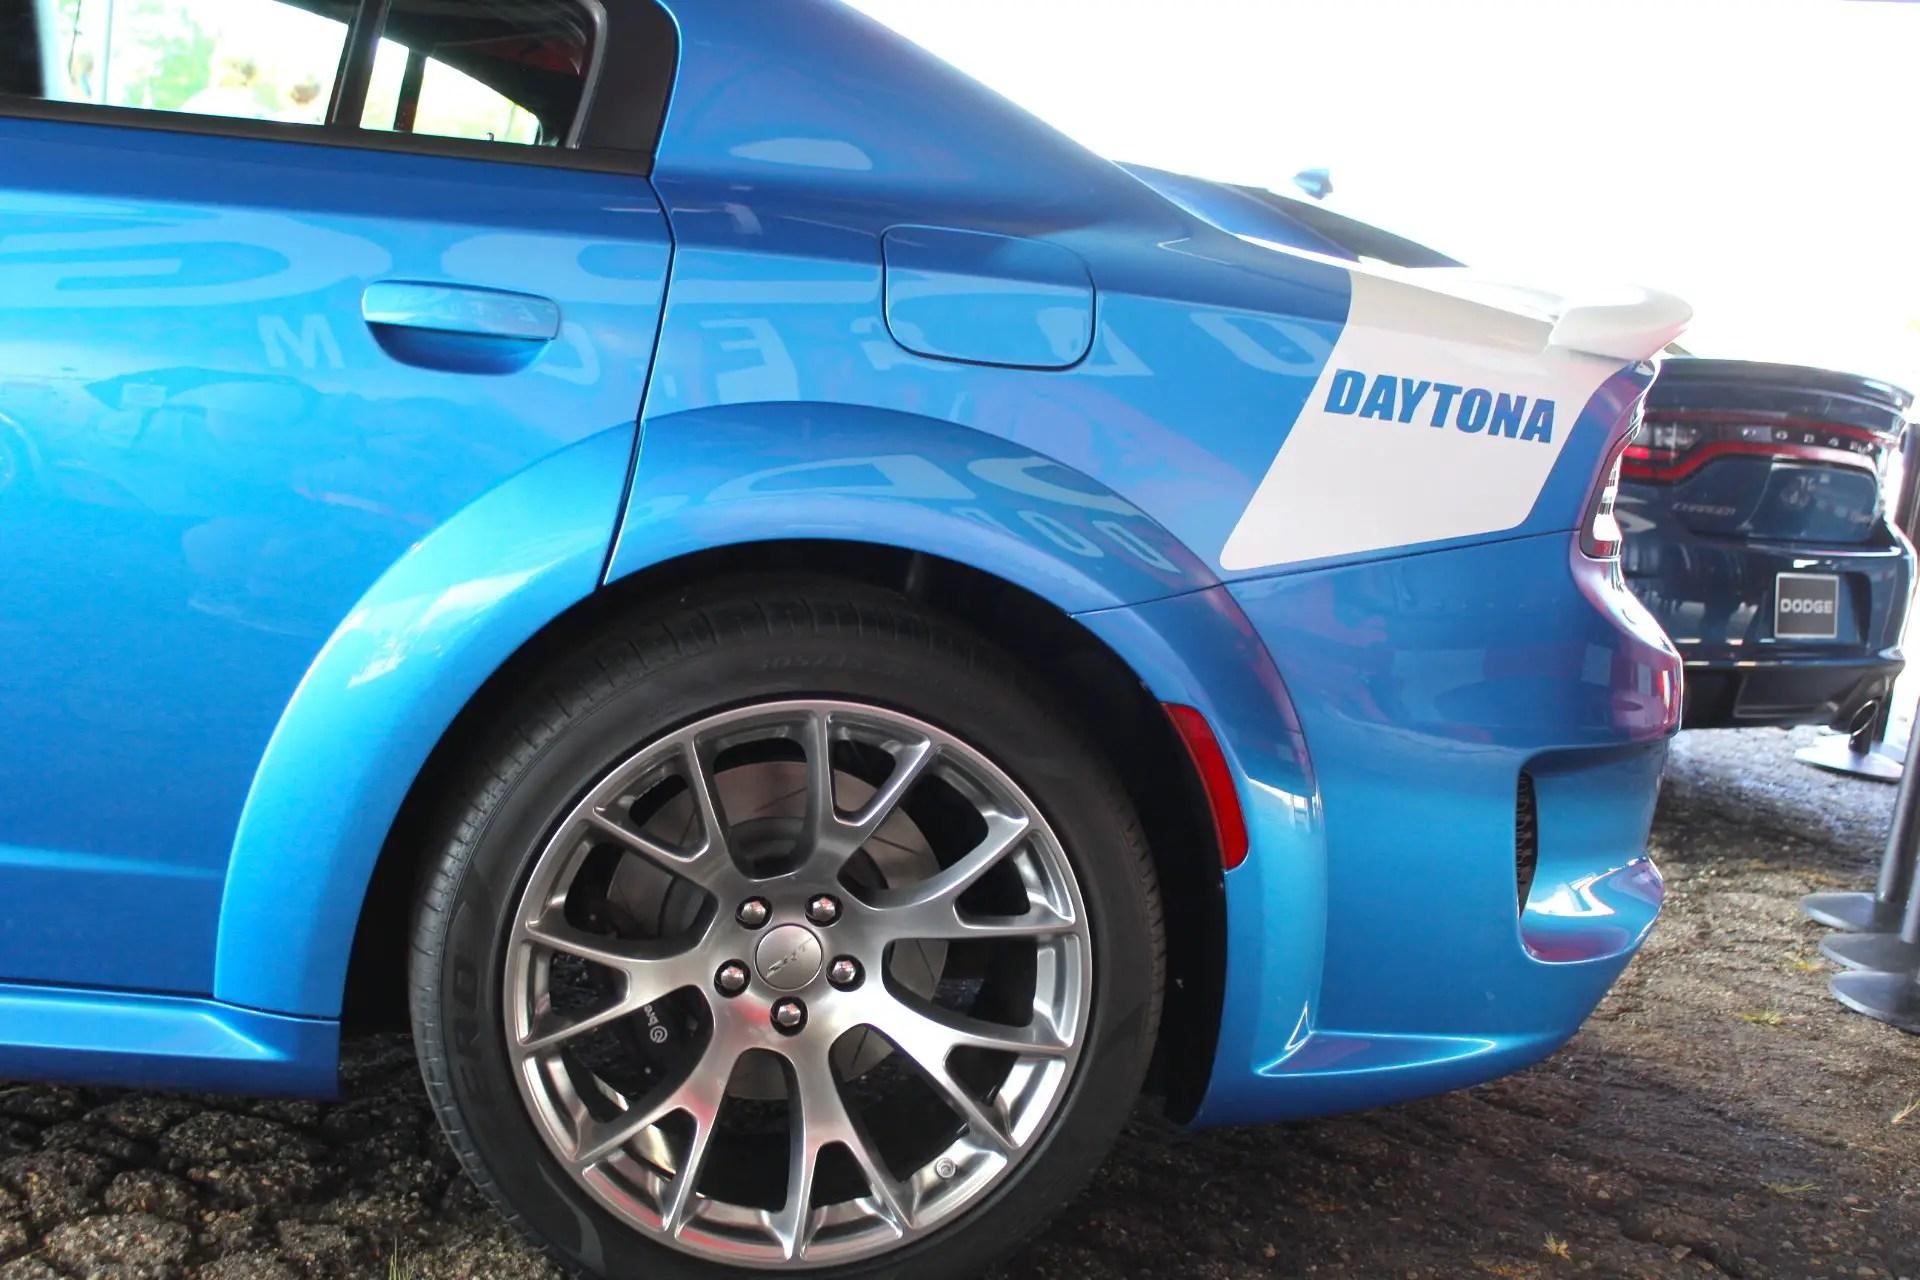 2020 Dodge Charger Hellcat Widebody Daytona 50th